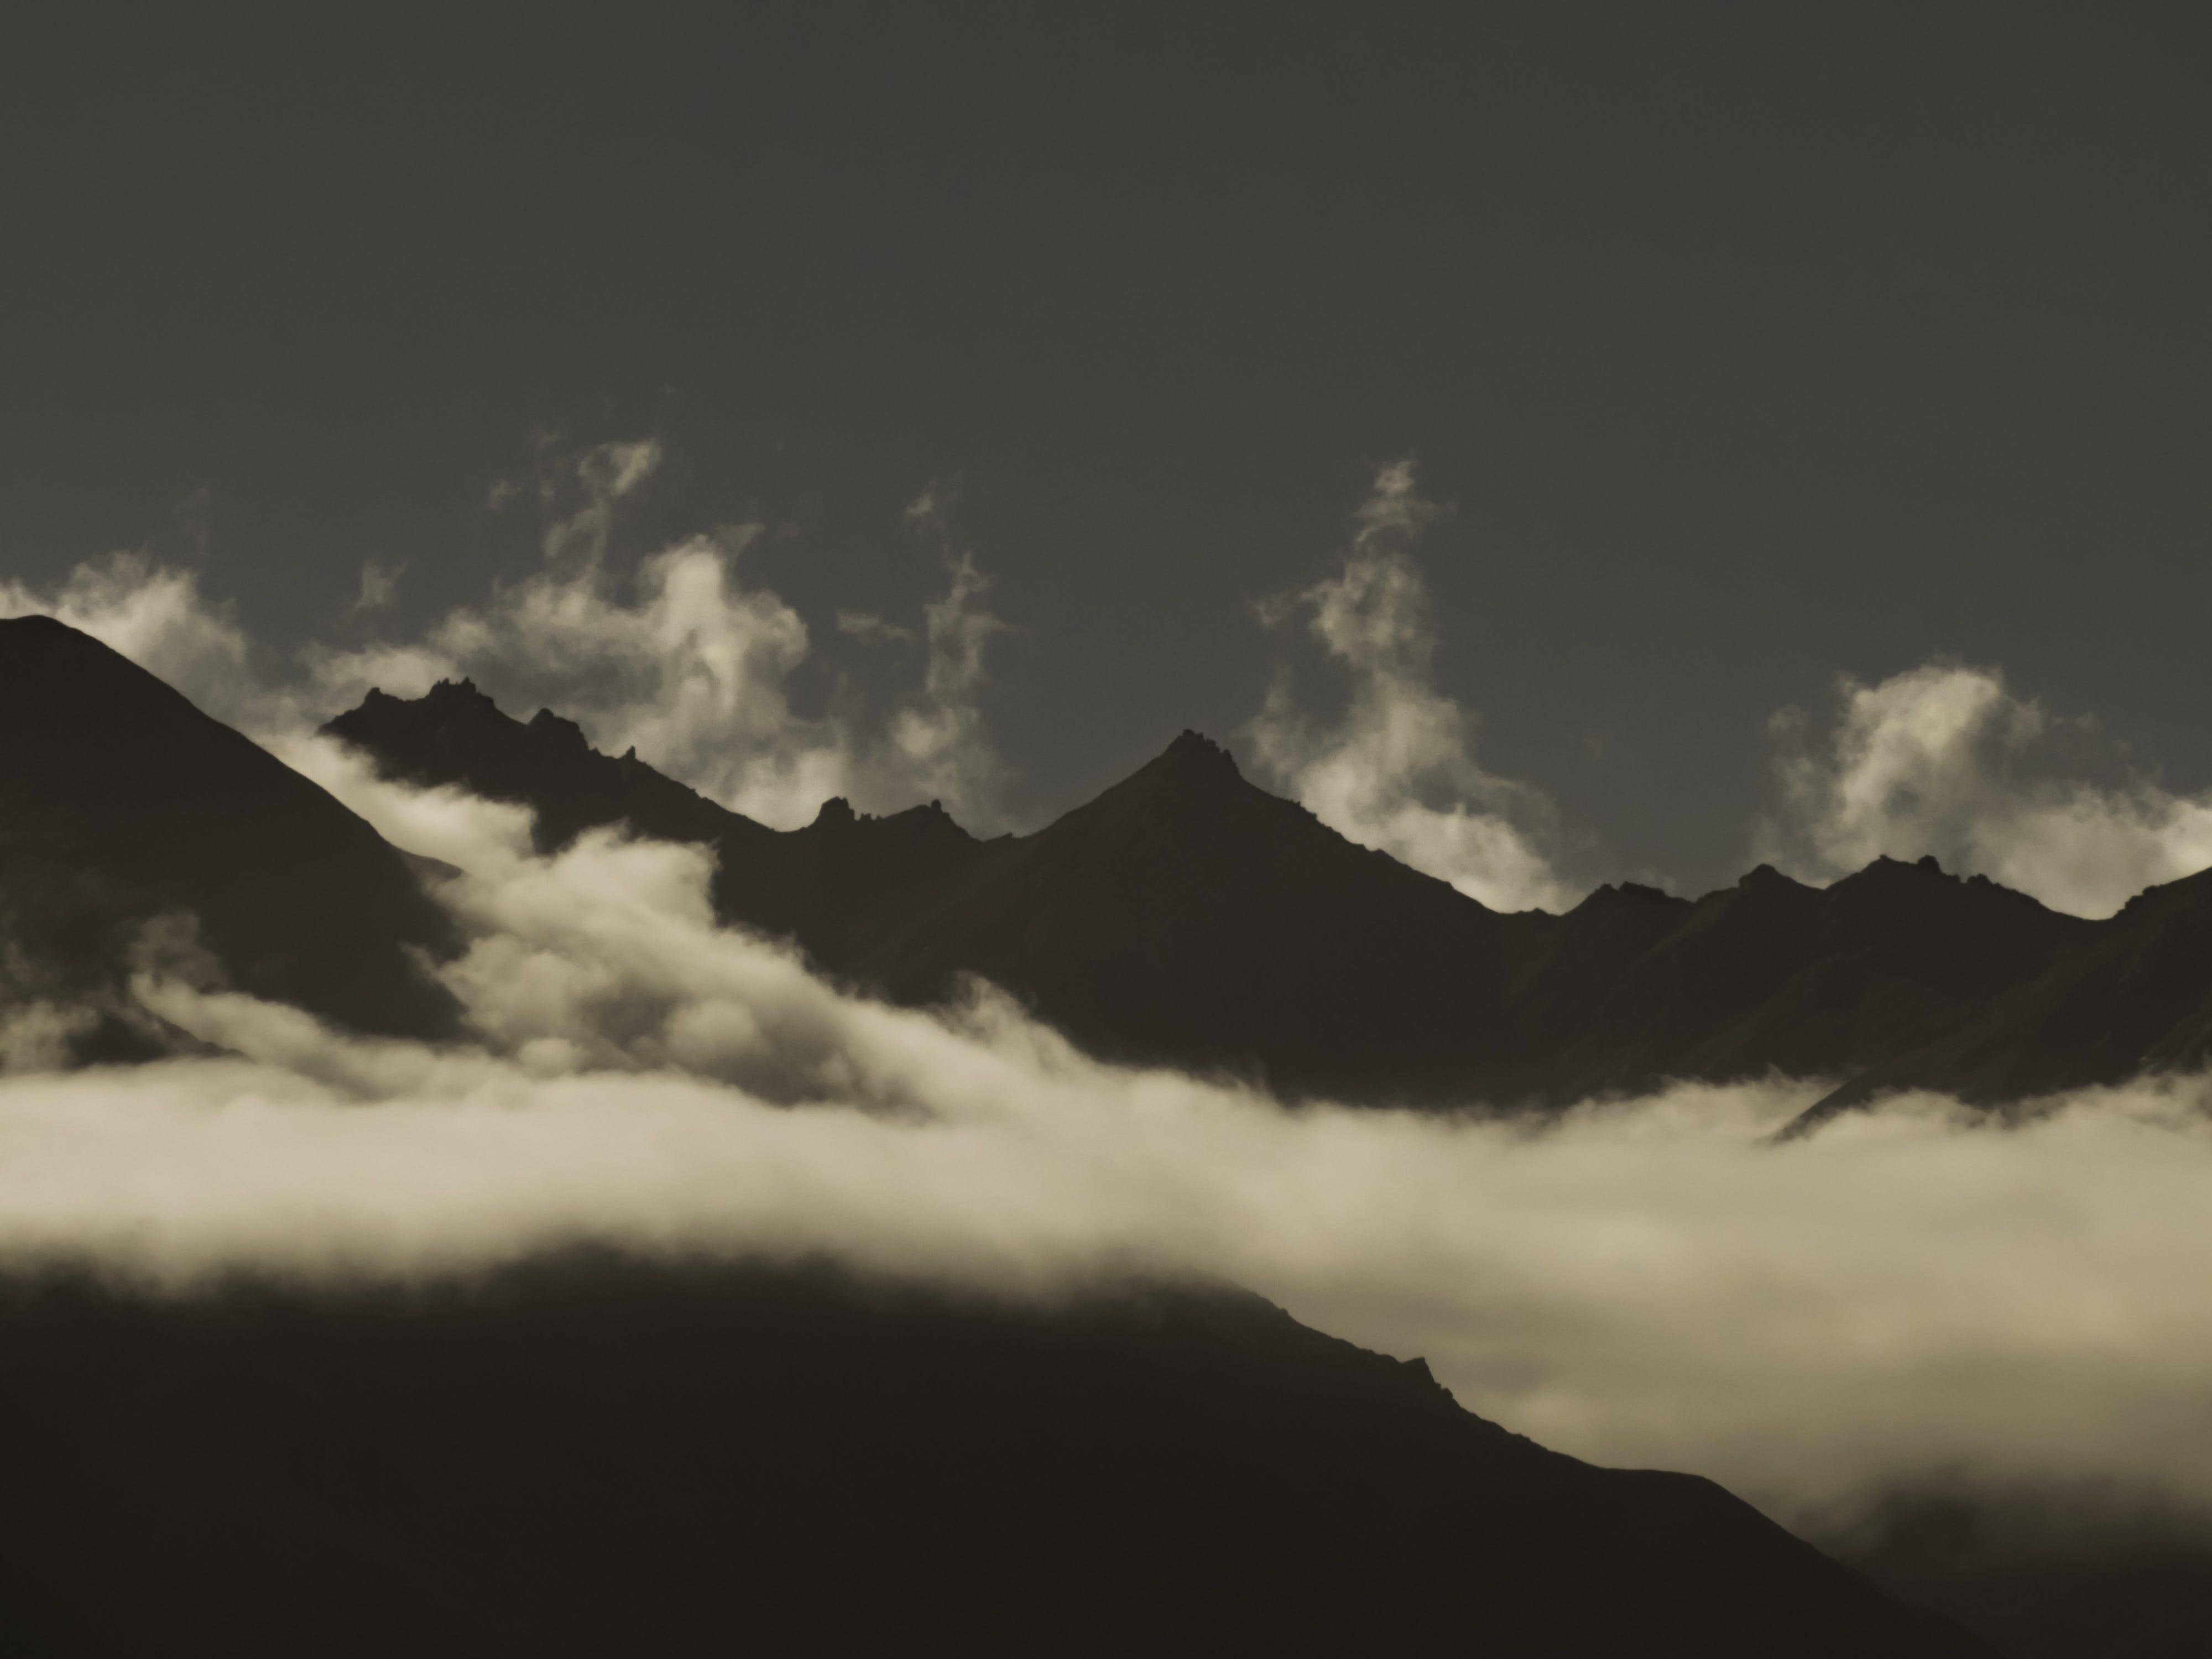 Free stock photo of mountains, night, clouds, dark